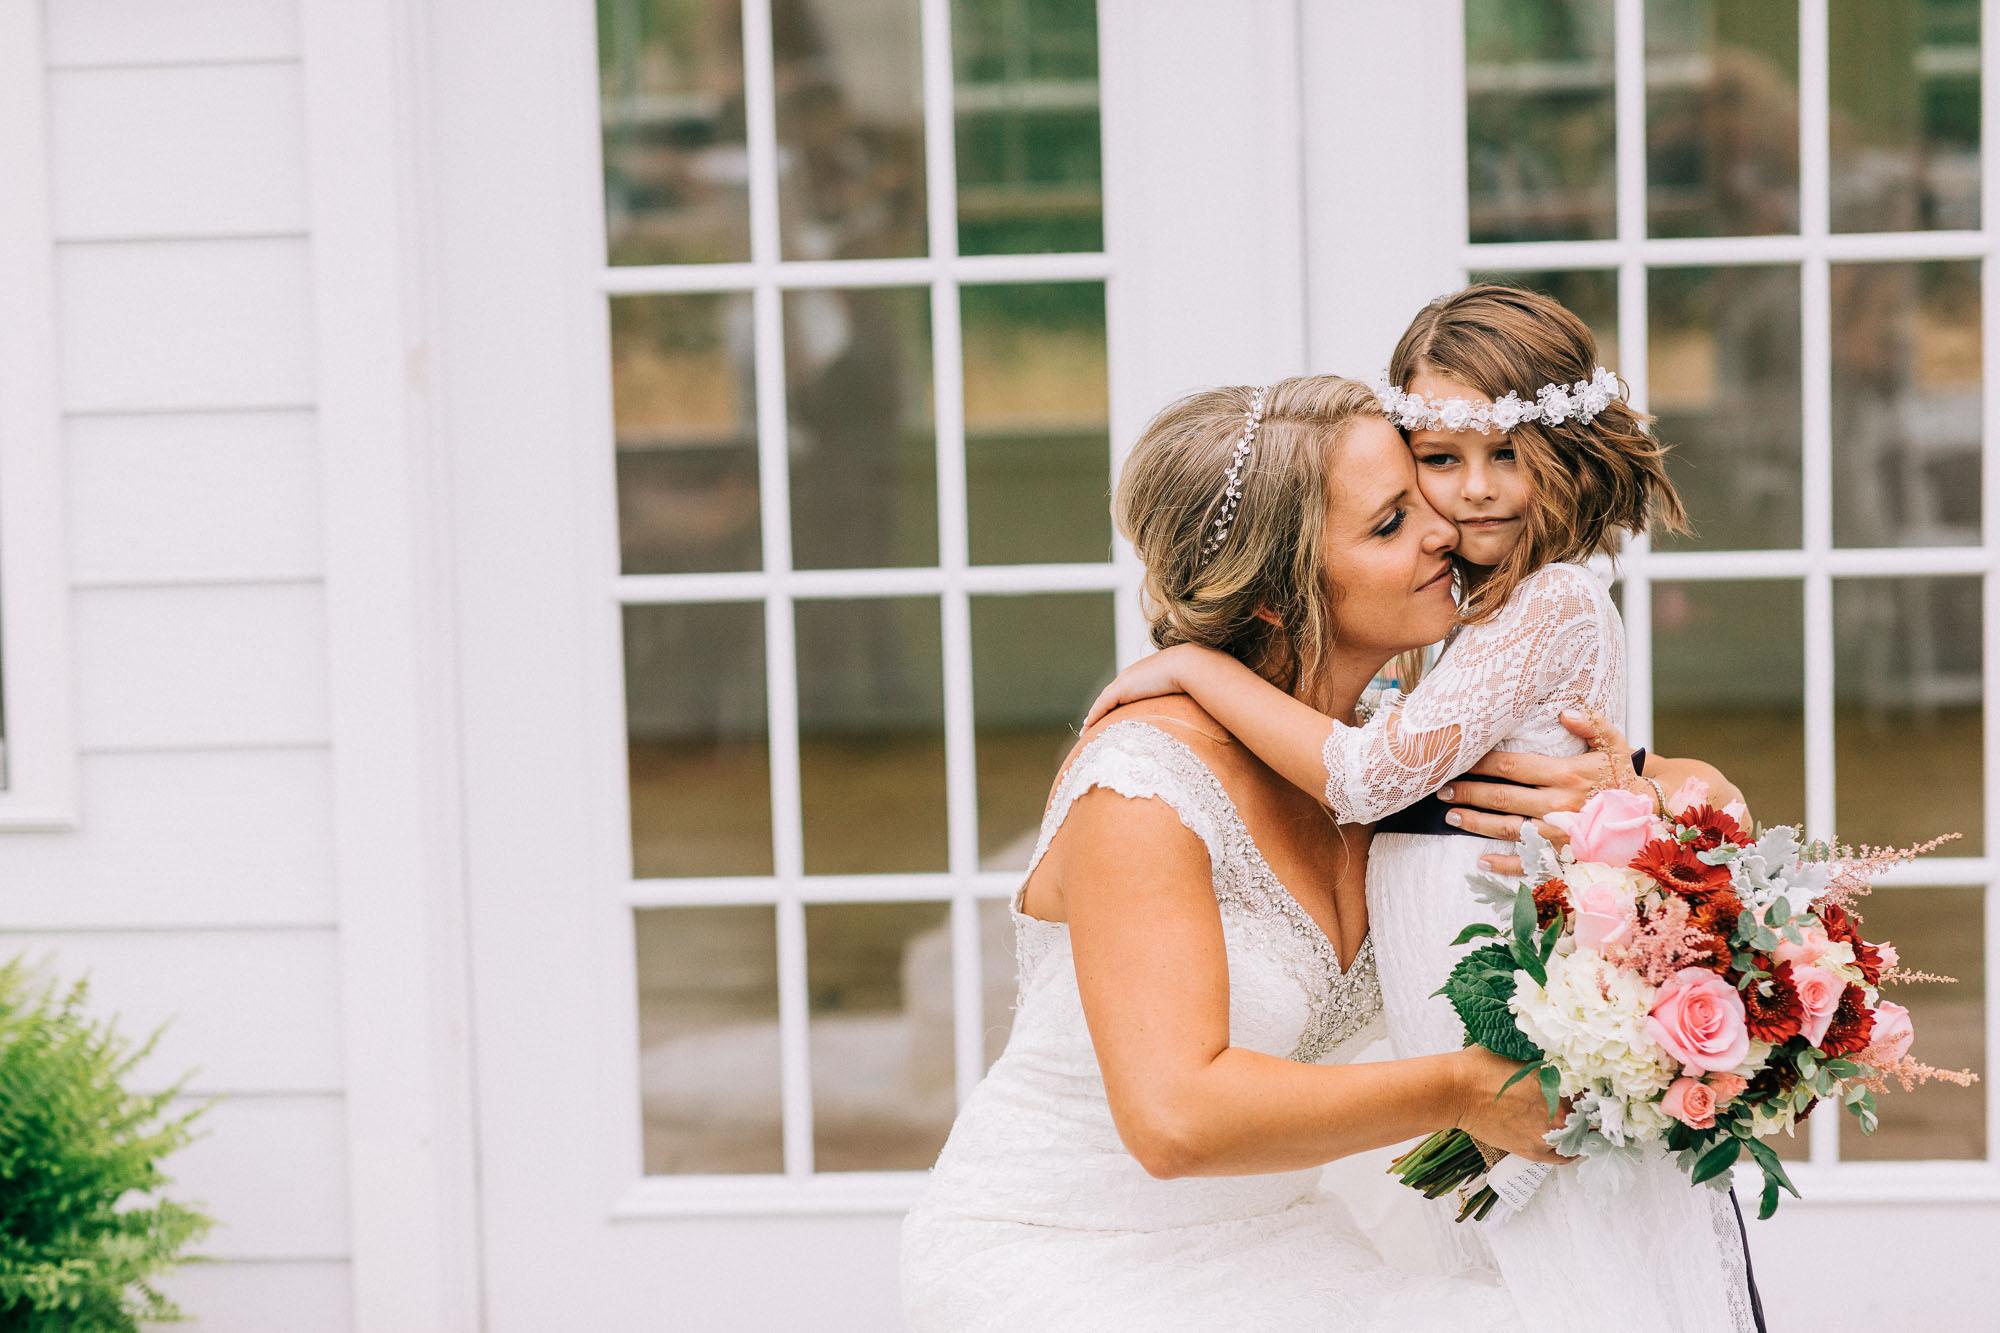 Lodge-at-Raven-Creek-October-wedding-41.jpg